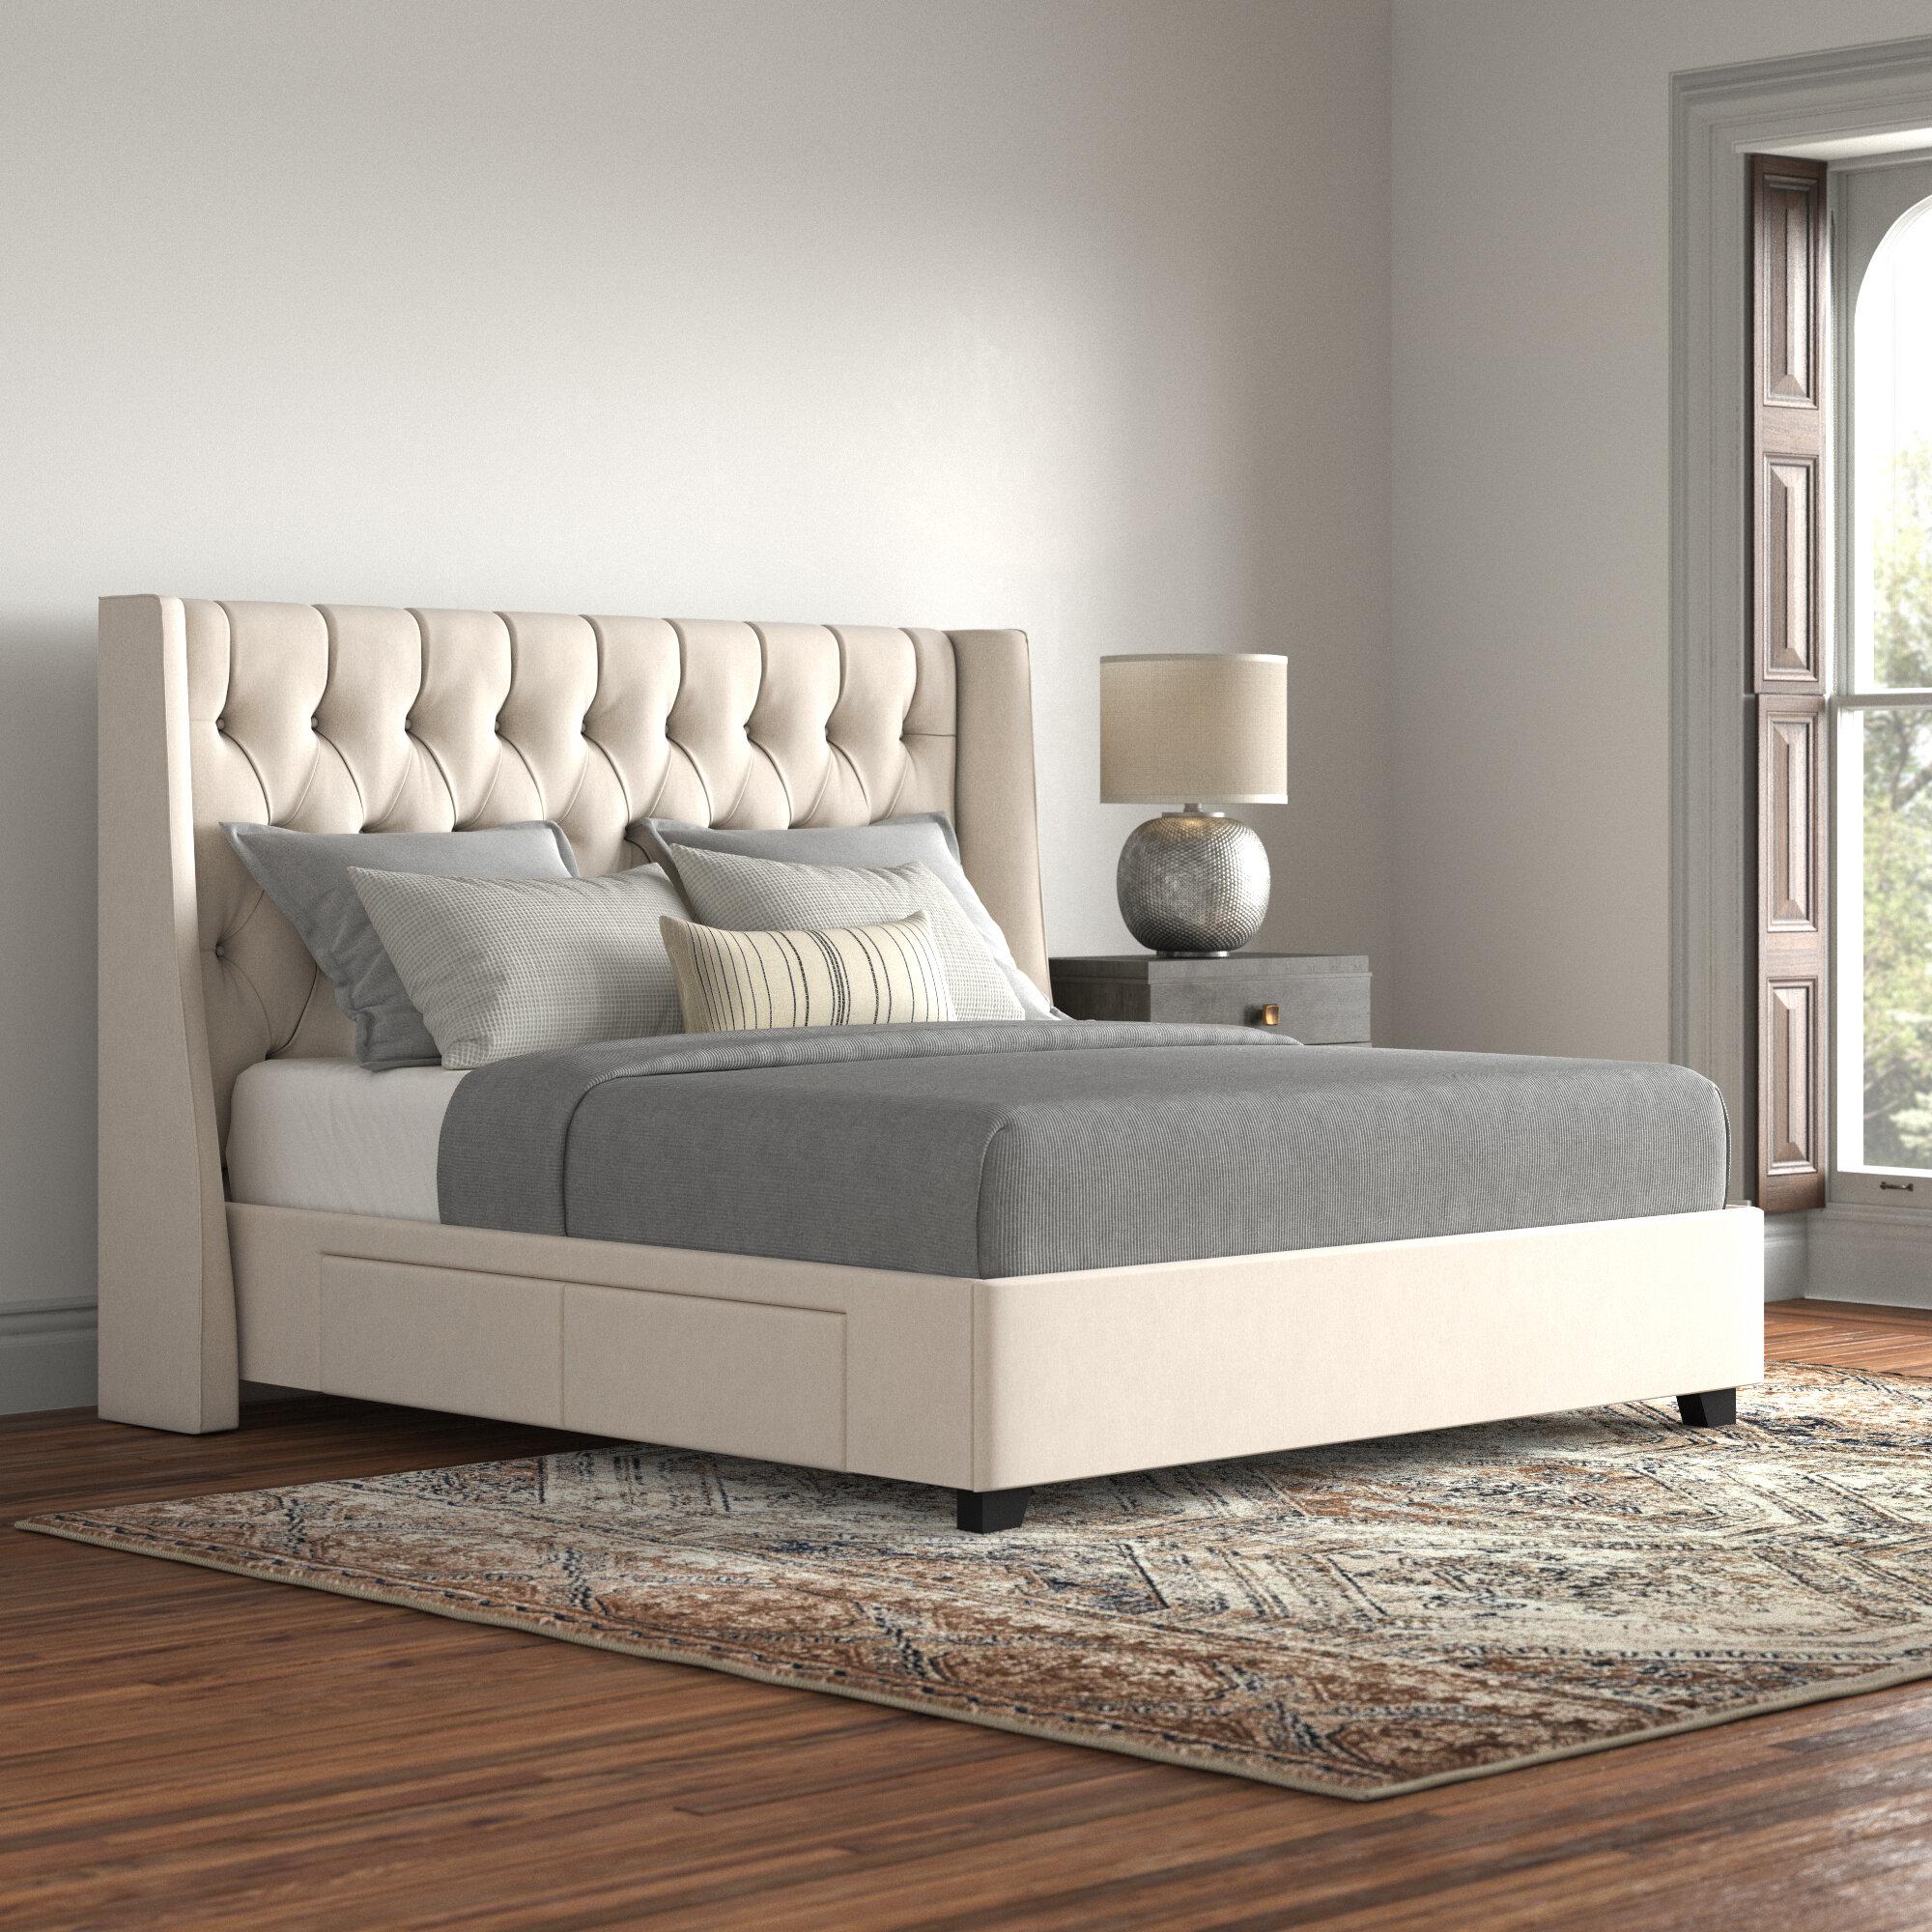 Larchmont Upholstered Storage Platform Bed Reviews Joss Main